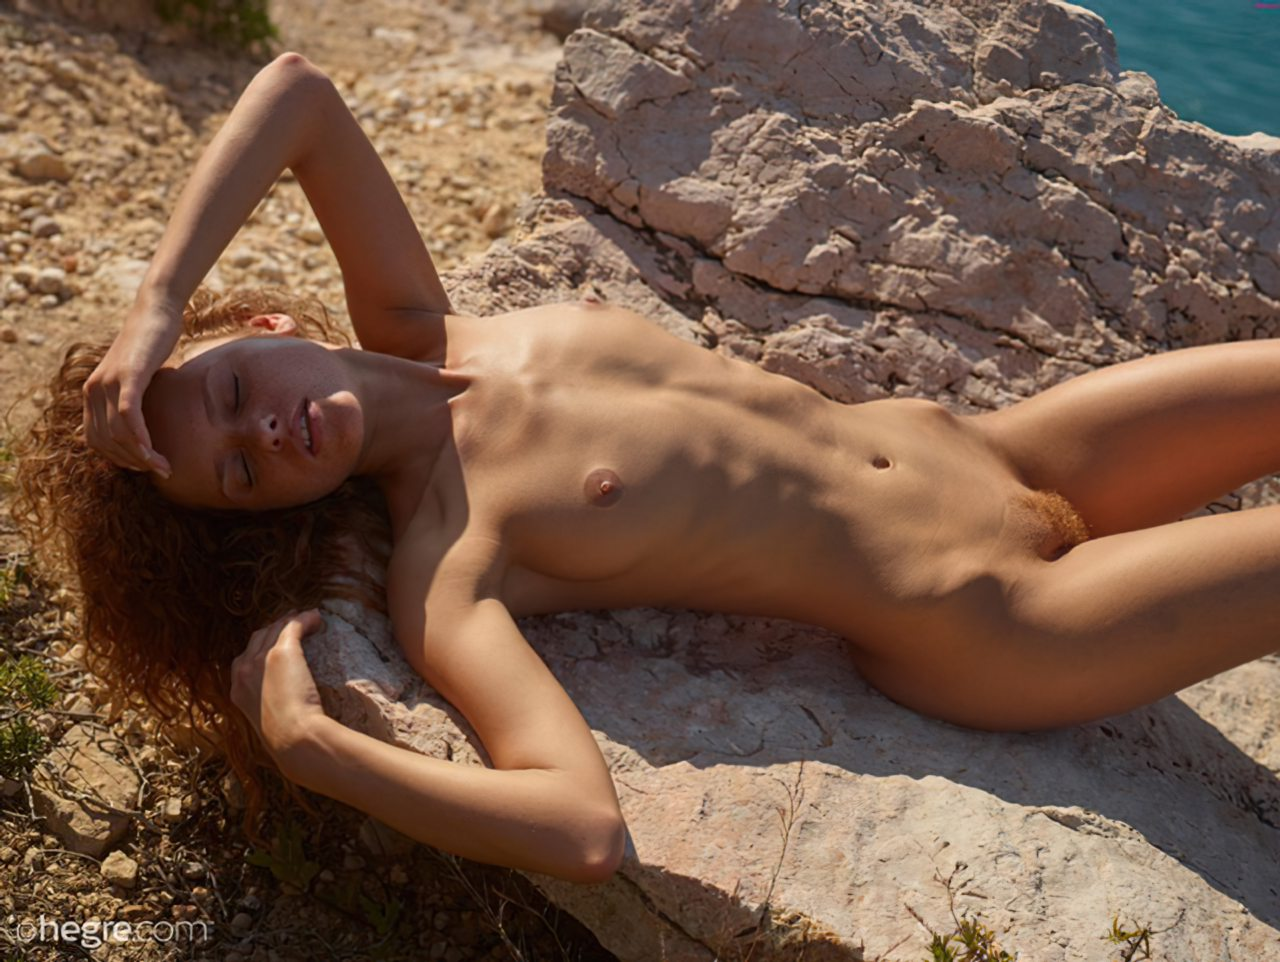 Fotos de Mulheres Nuas (21)